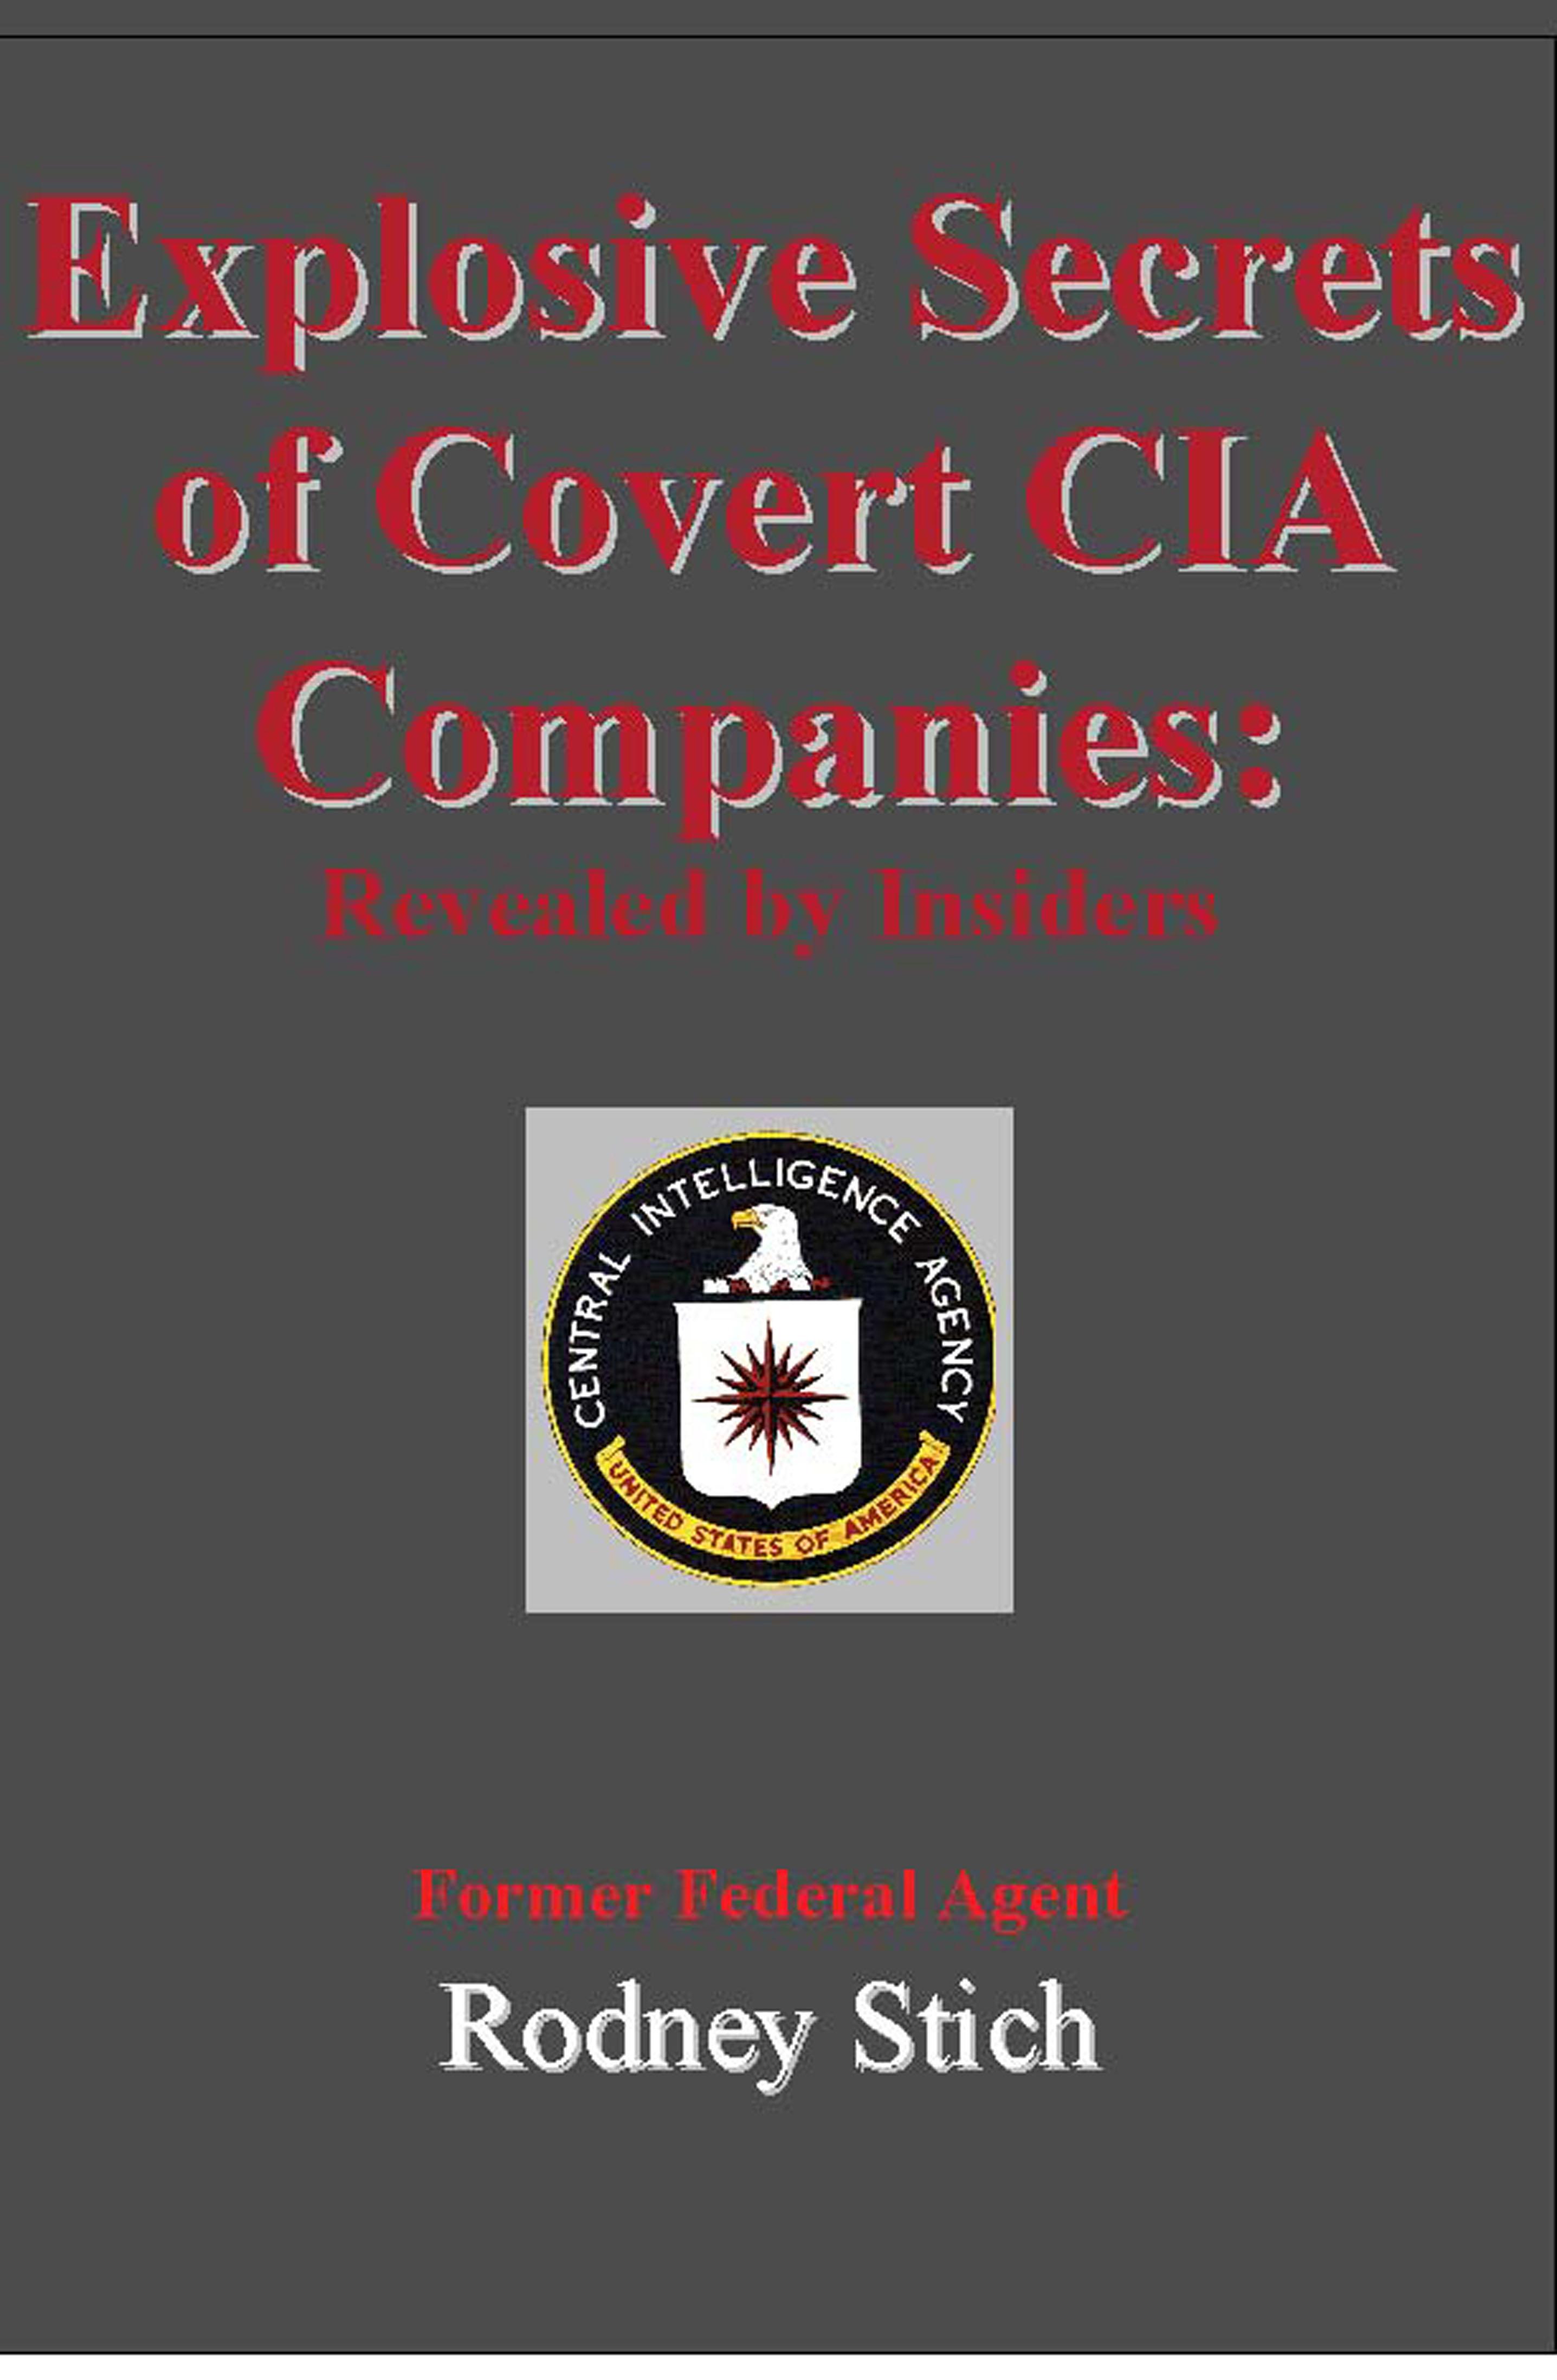 Explosive Secrets of Covert CIA Companies EB9780932438461